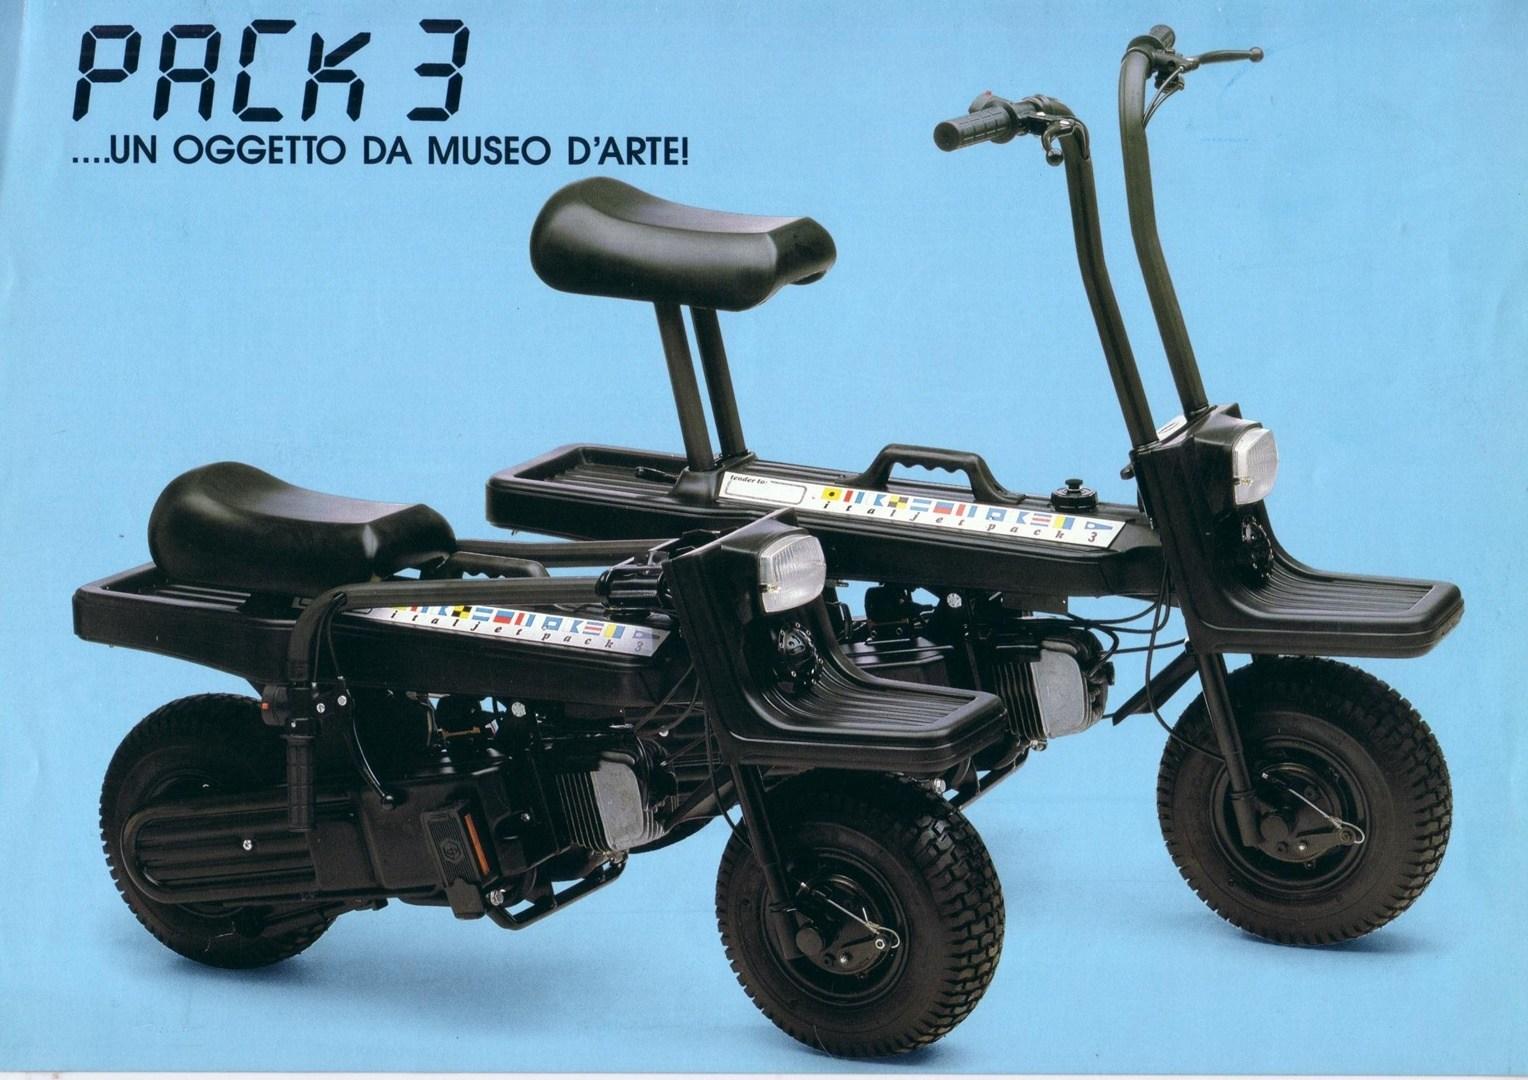 Moto del día: Italjet Pack 2 y Pack 3